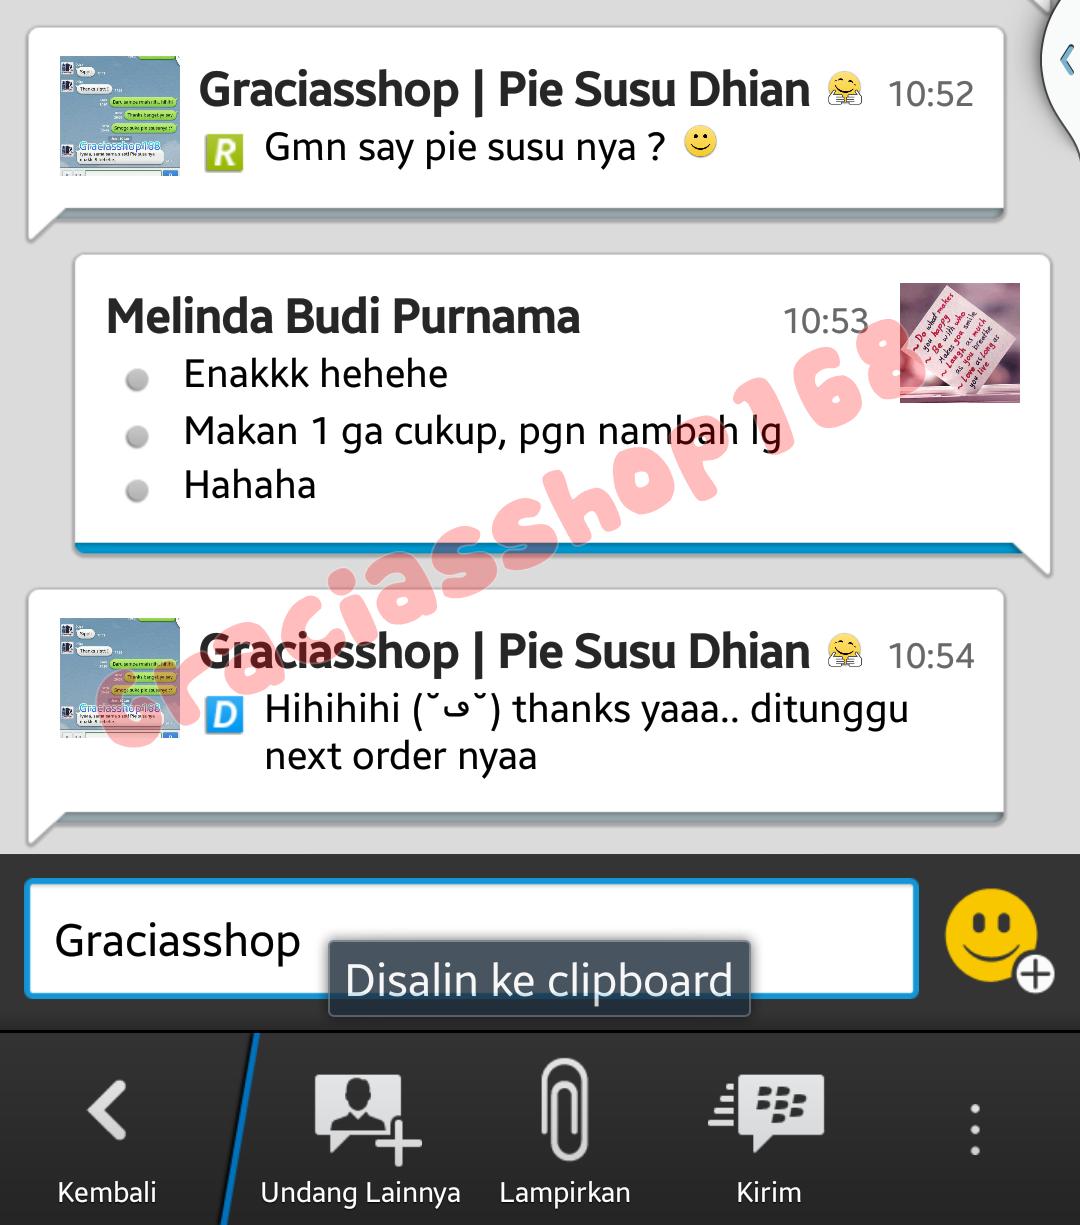 Pie Susu Dhian Bandung Khas Bali Tunggu Apalagi Silahkan Hubungi Contact Person Kami Dan Rasakan Kenikmatan Tiada Duanya Dari